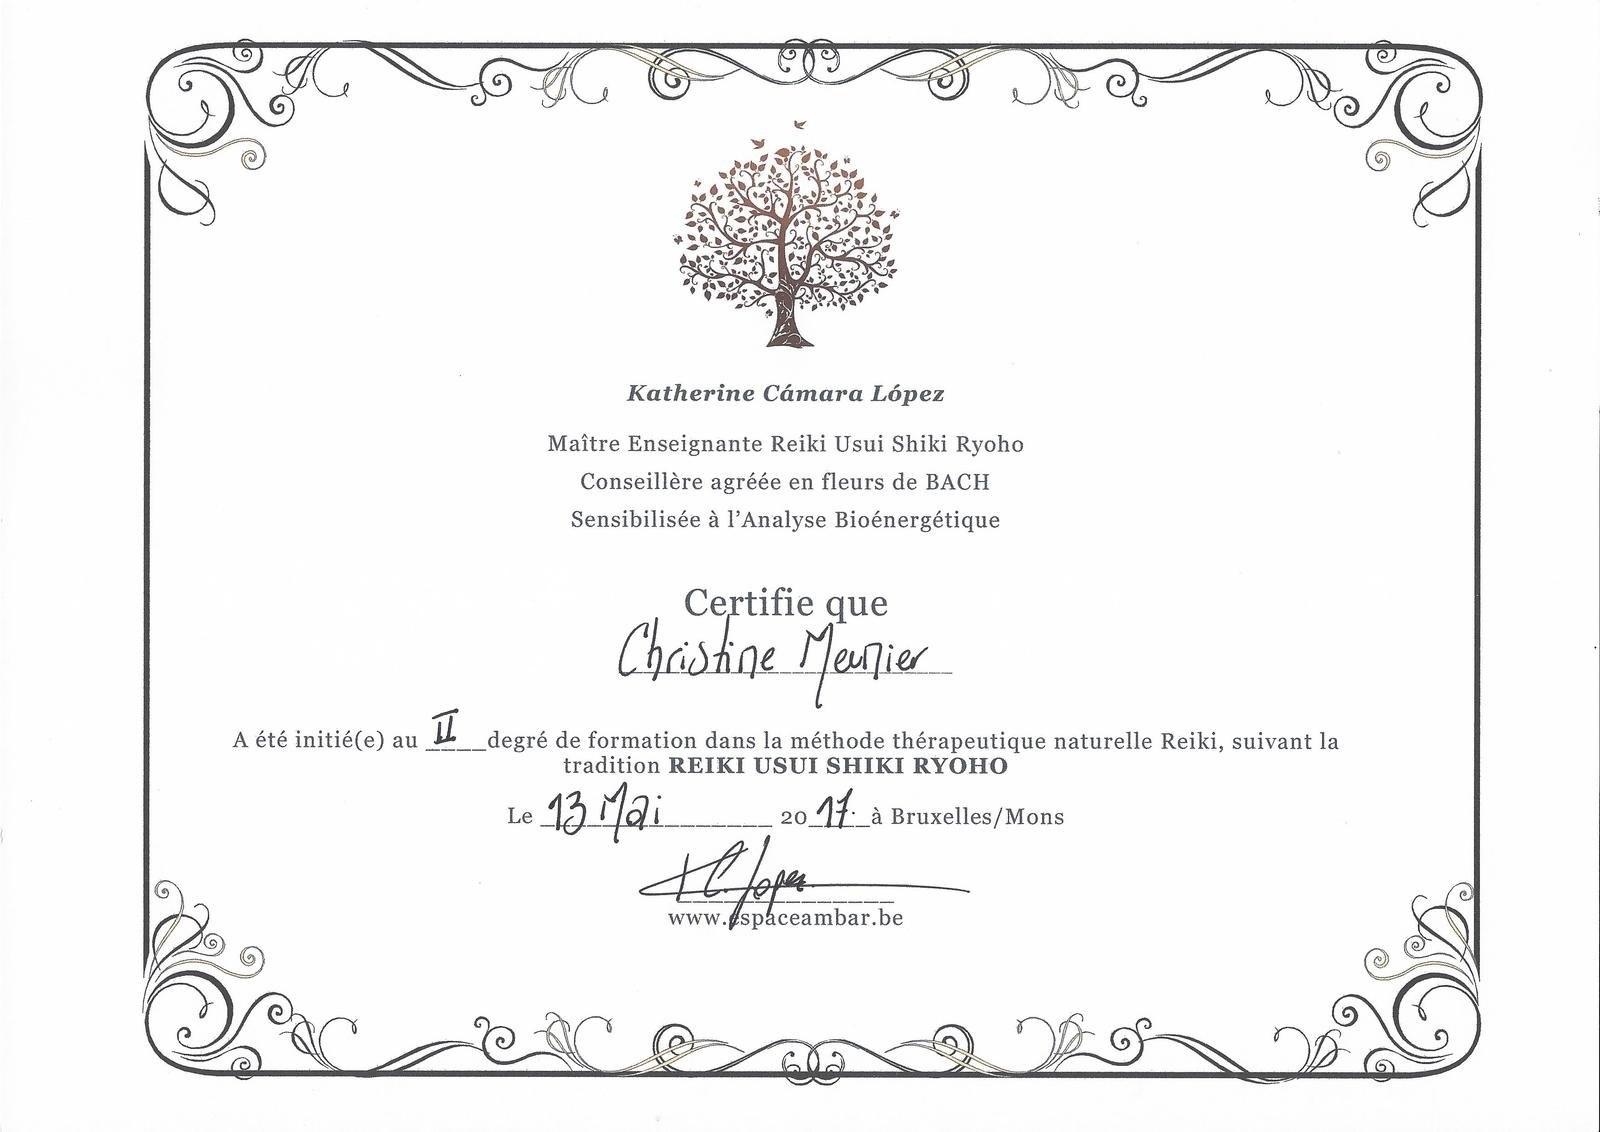 Borderless Certificate Templates  Mandegar Intended For Borderless Certificate Templates